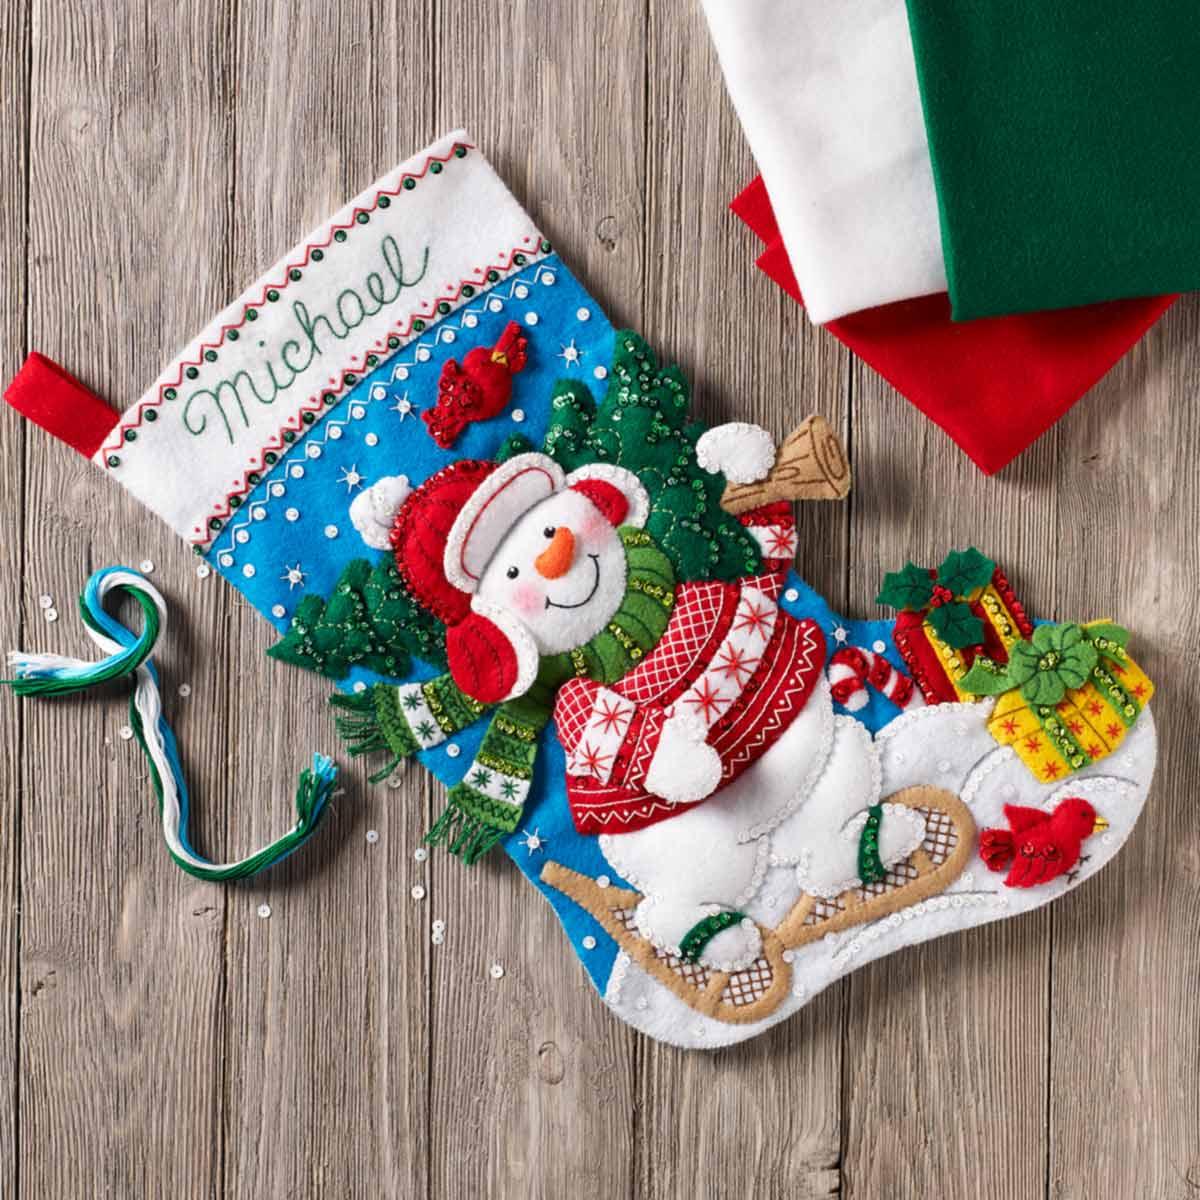 Bucilla ® Seasonal - Felt - Stocking Kits - Nordic Snowman